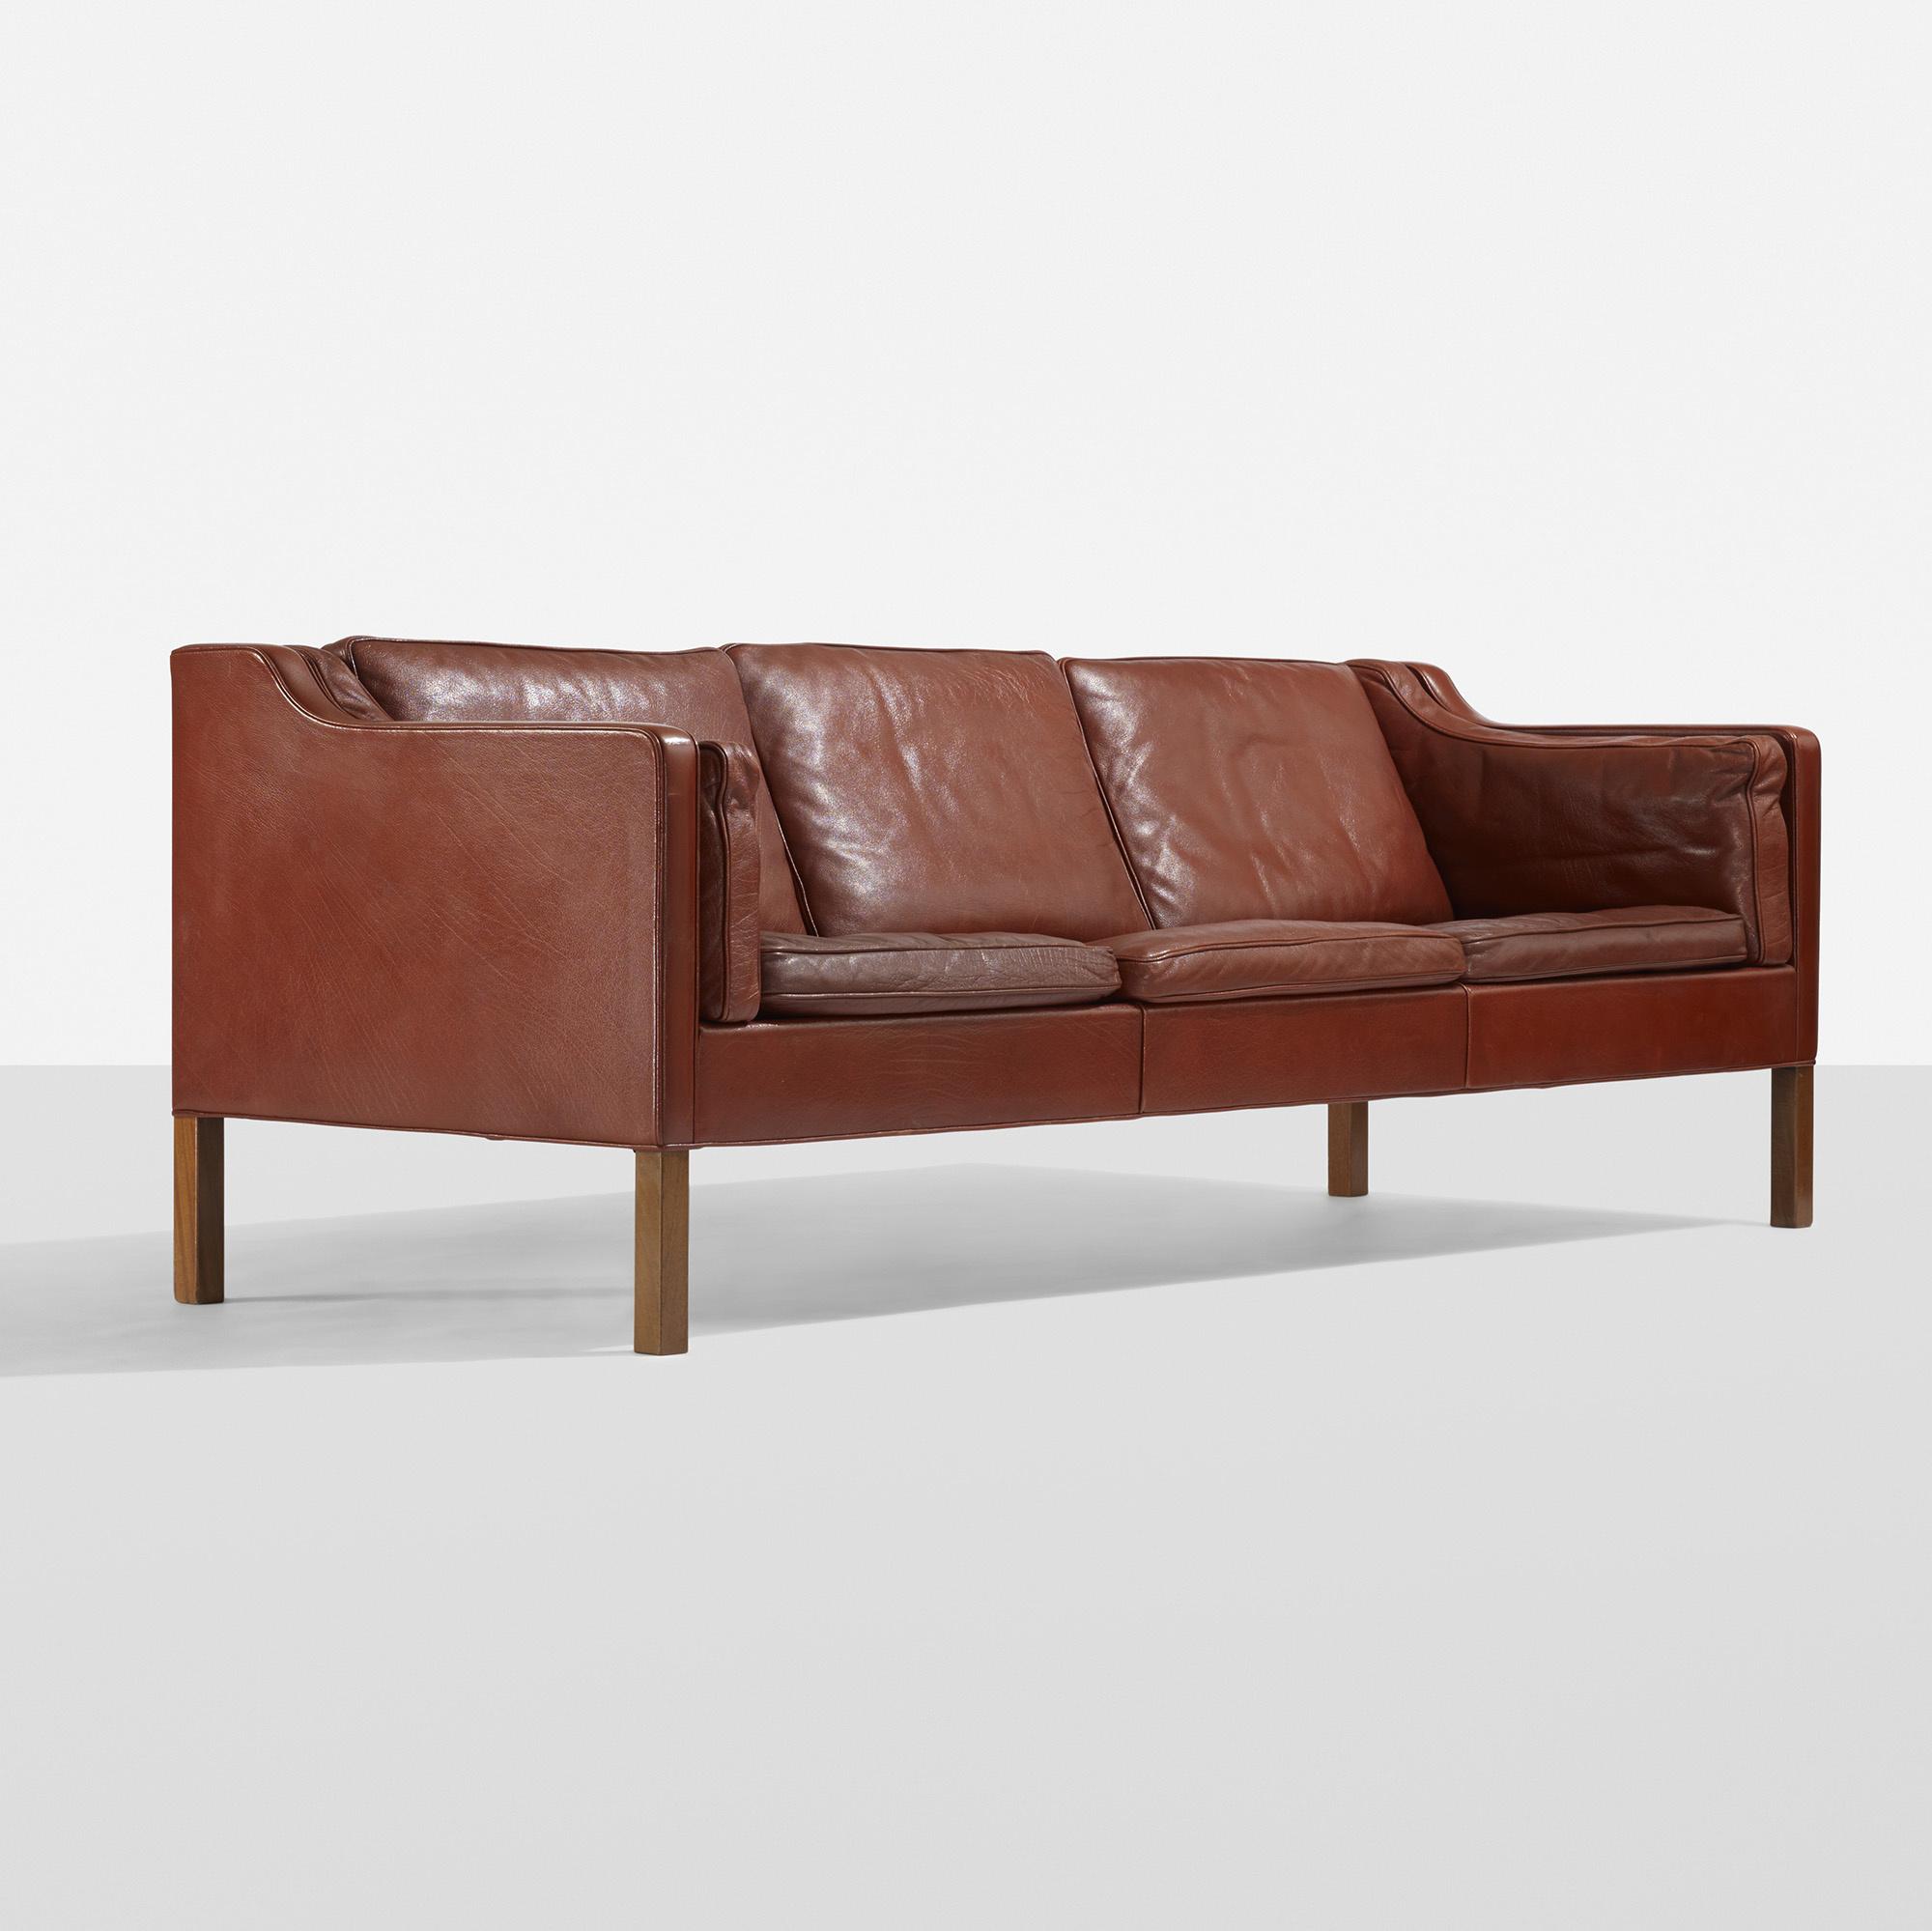 259 Børge Mogensen Sofa 1 Of 4